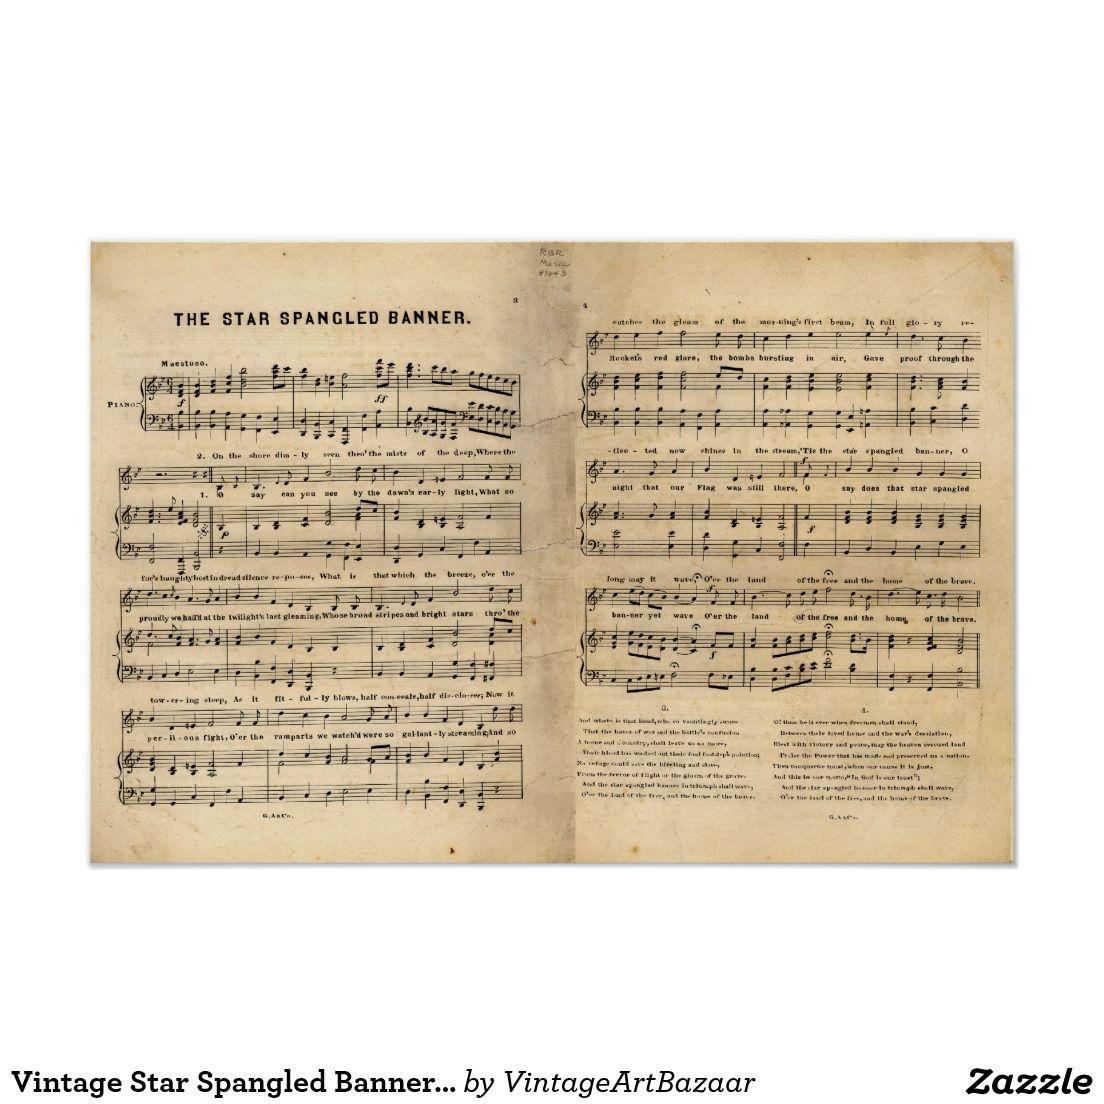 Vintage Star Spangled Banner Song Sheet Lyrics Poster Zazzle Com Lyric Poster Star Spangled Banner Song Song Sheet